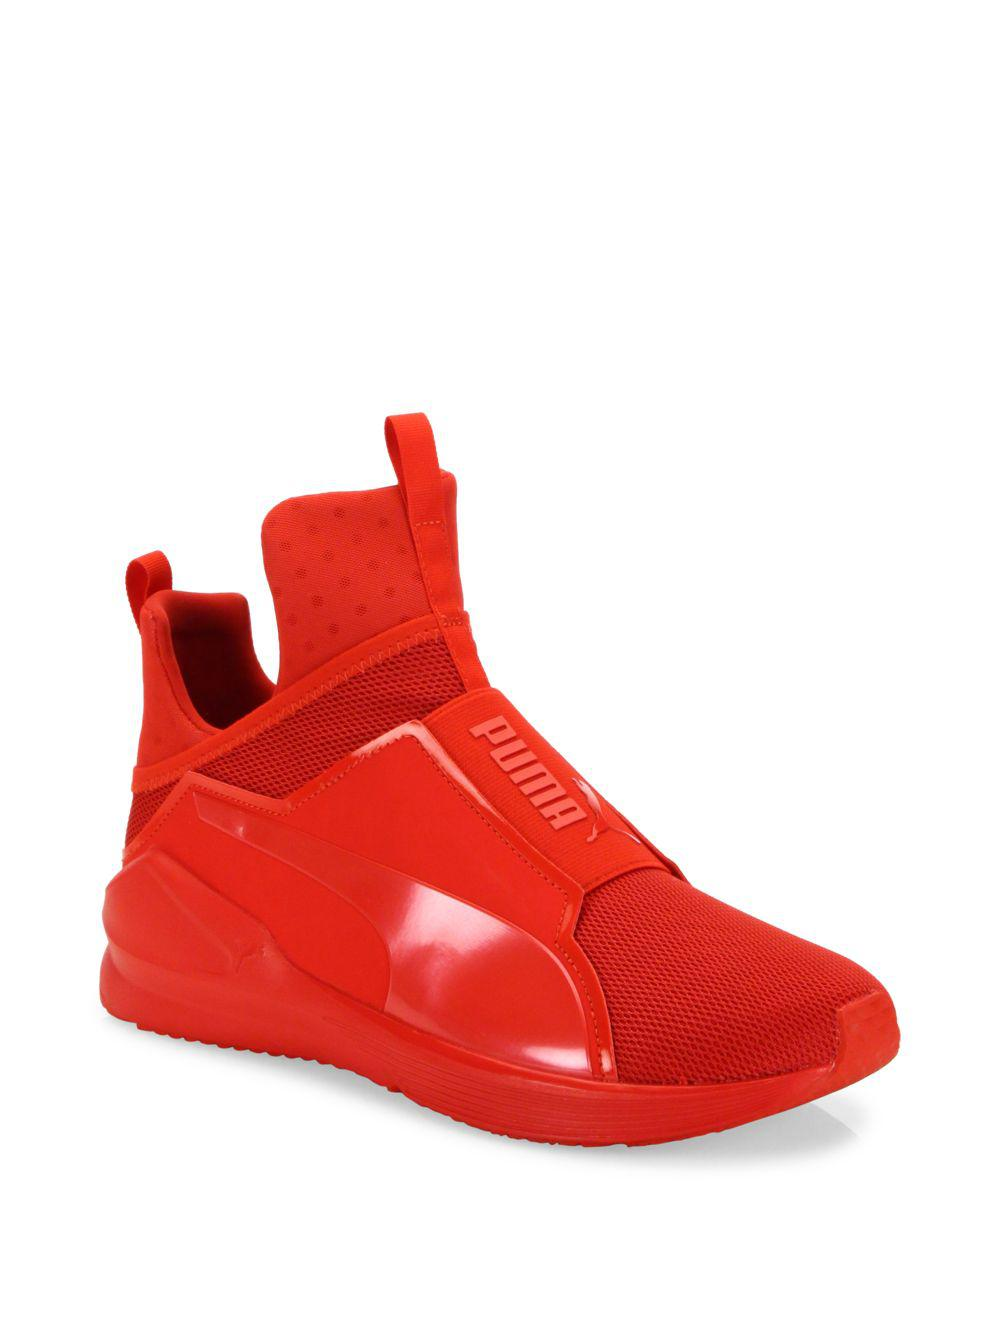 ea9fa4136920 ... authentic lyst puma fierce core ariaprene high top sneakers in red for  men 55216 3f5cf